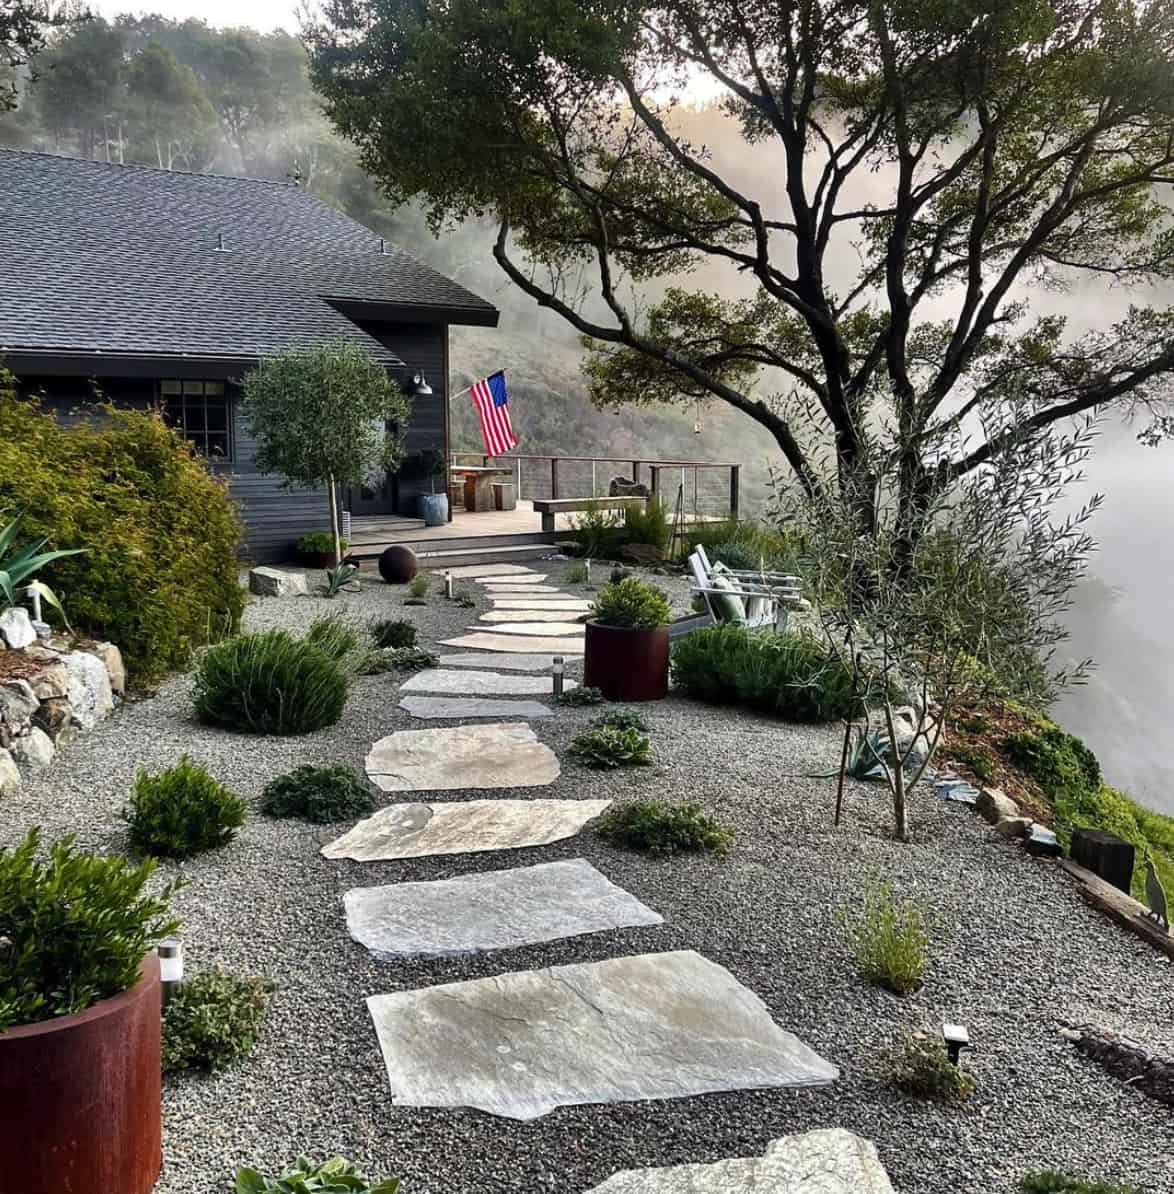 garden-stone-pathway-beach-house-misty-morning